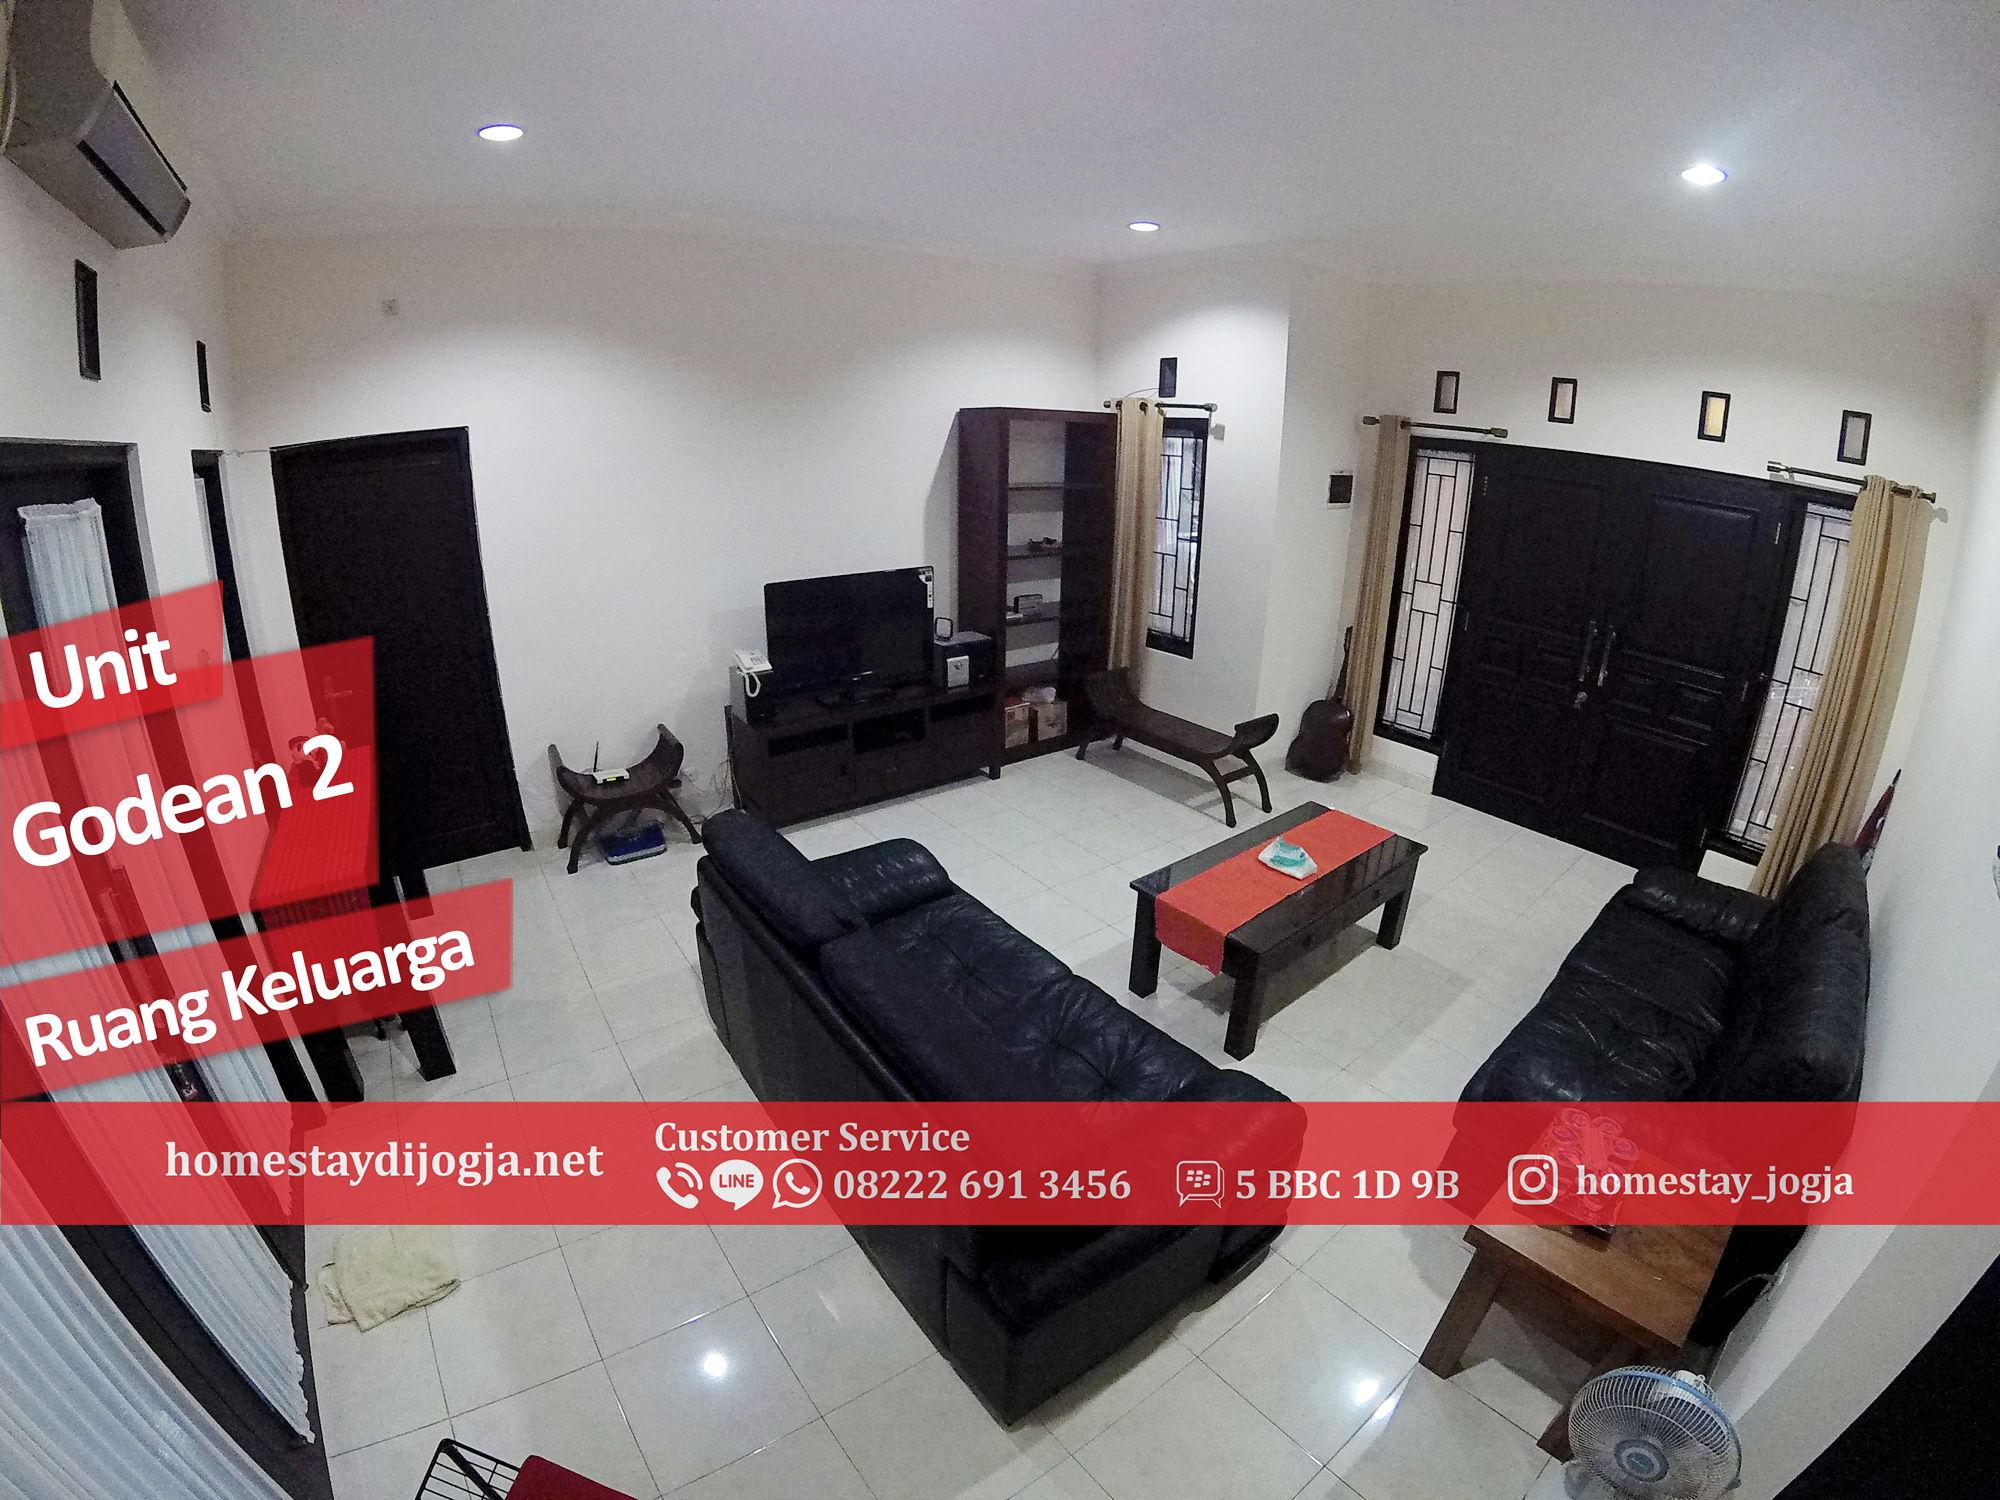 Guest House Jogja 4 Kamar Tidur AC + Wifi 10 menit menuju malioboro di Godean